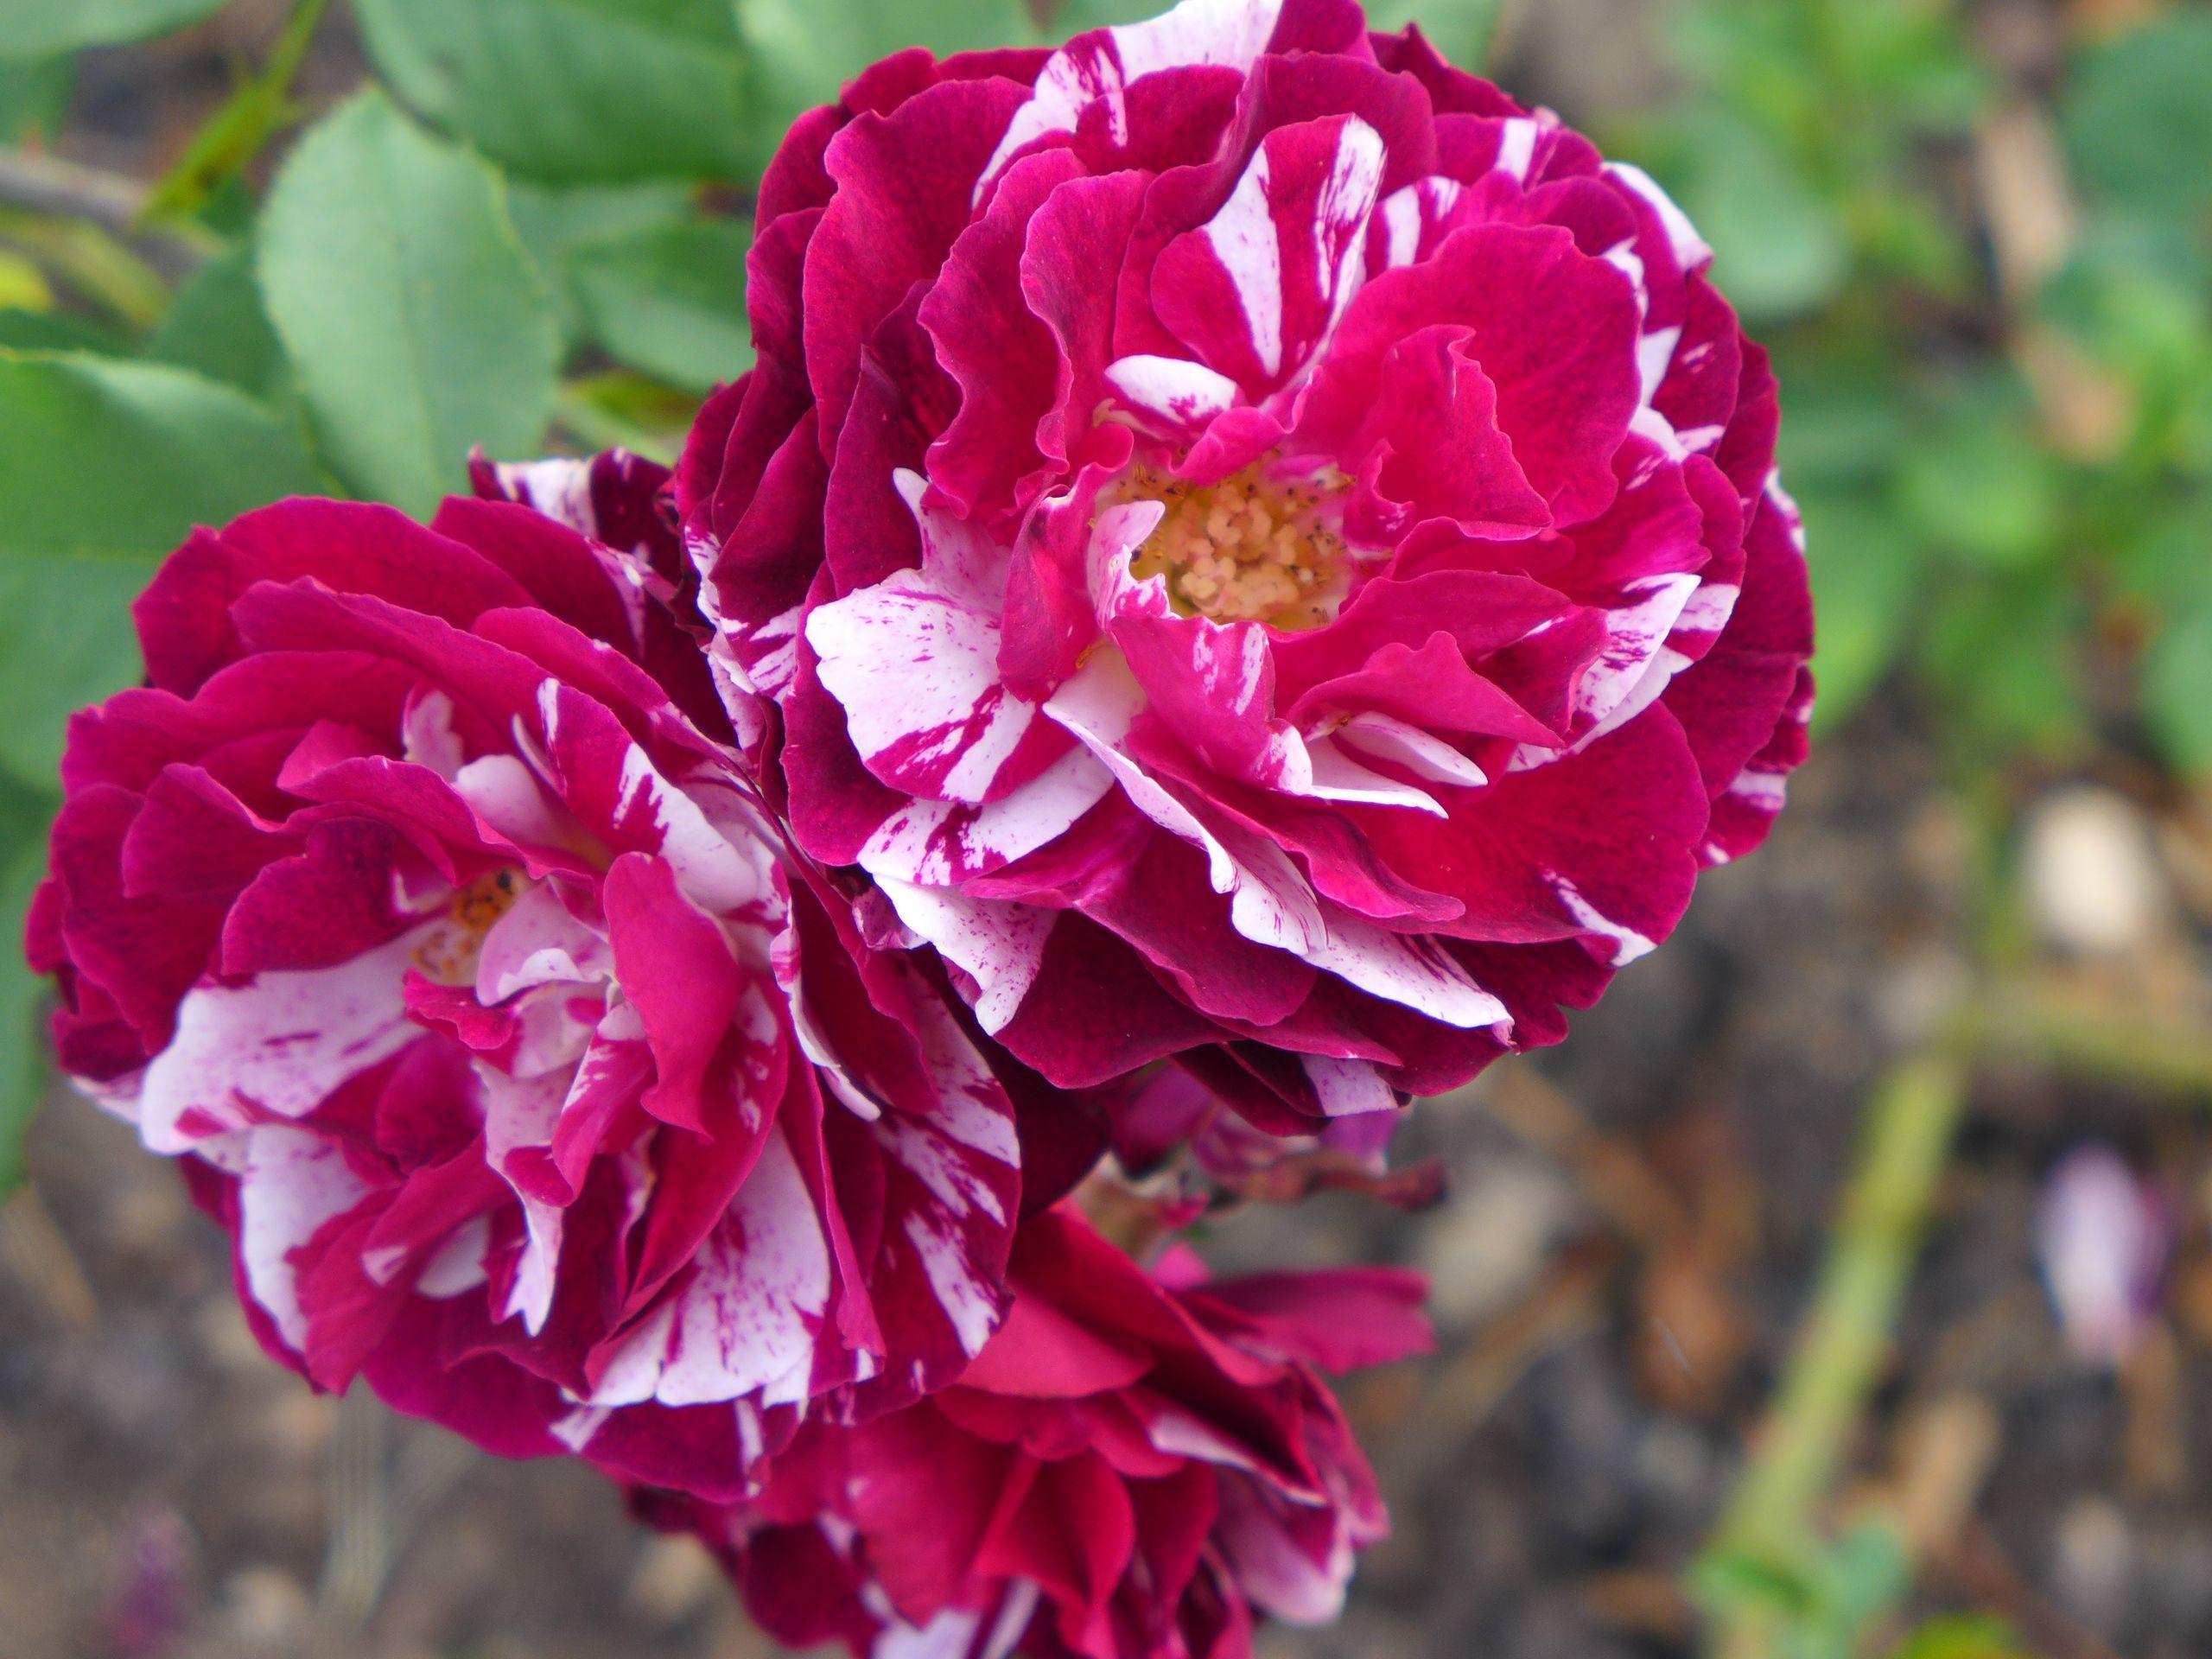 Roses bicolores;Lyon;Parfum;rose;OlfaGones;OlfaPhily